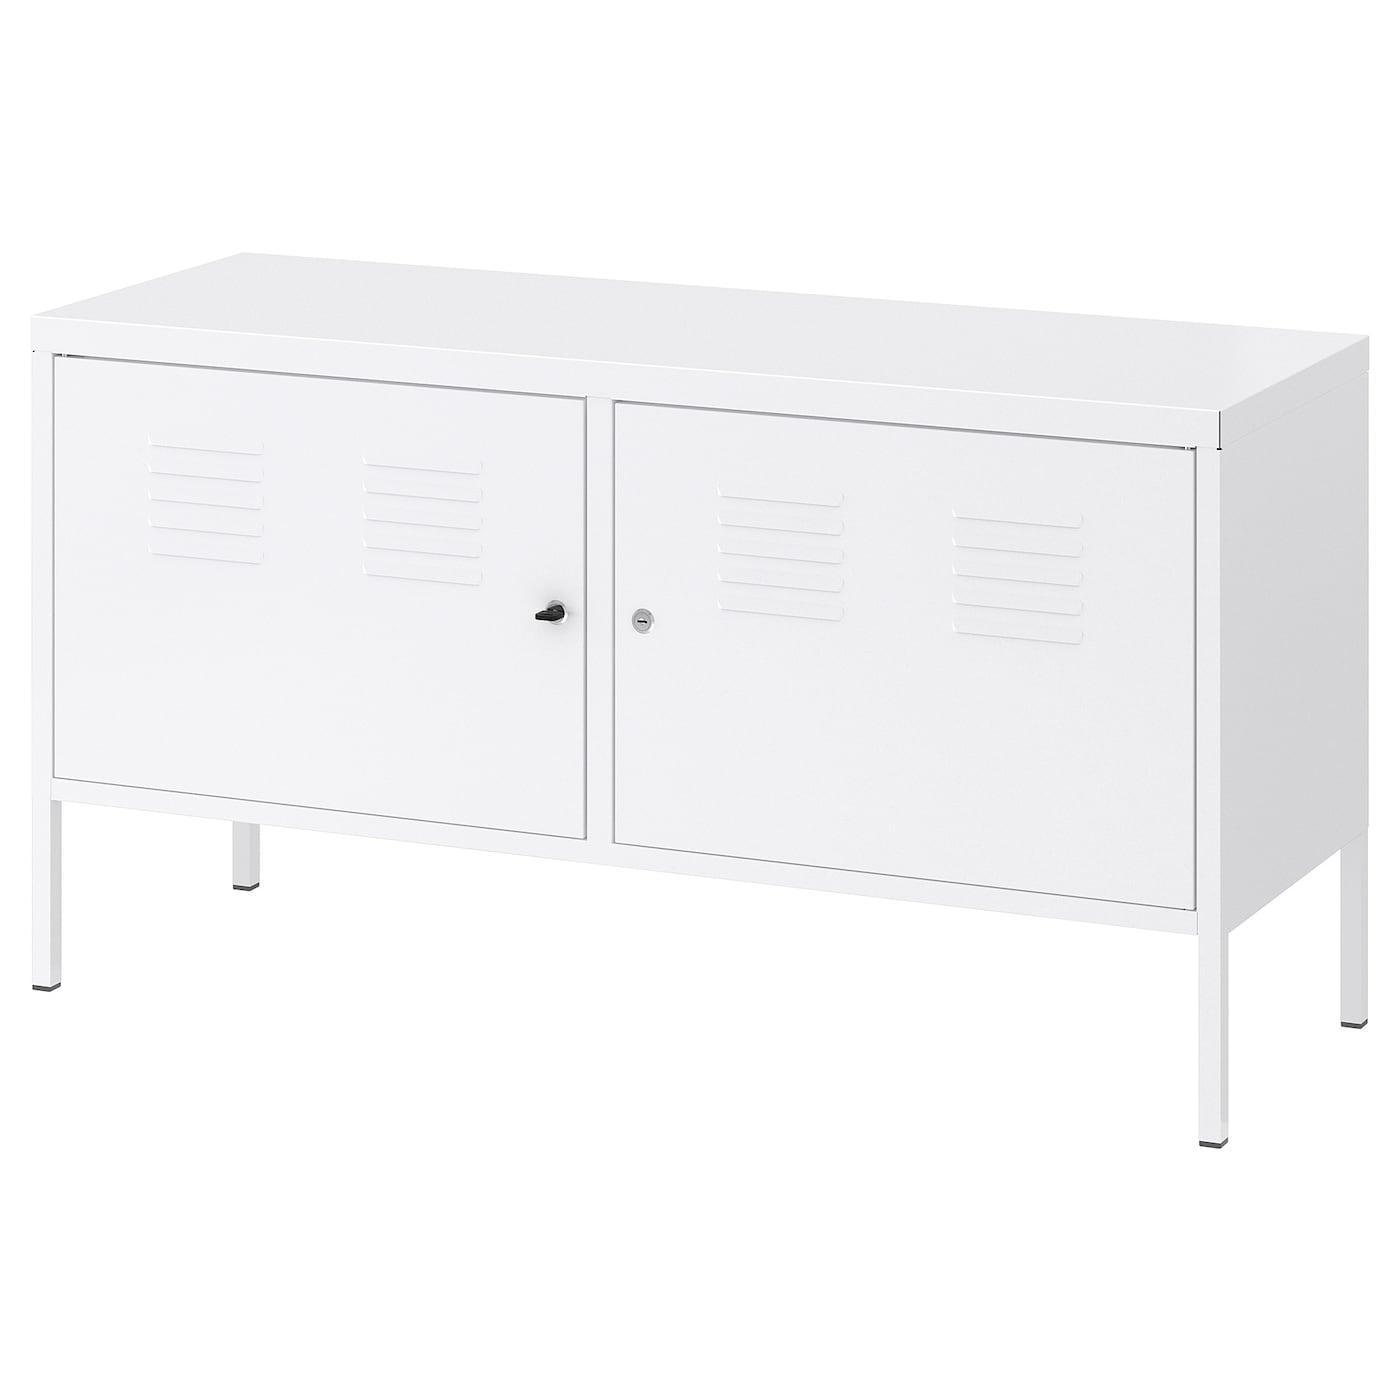 Ikea Meuble Blanc Laqué ikea ps armoire métallique - blanc 119x63 cm